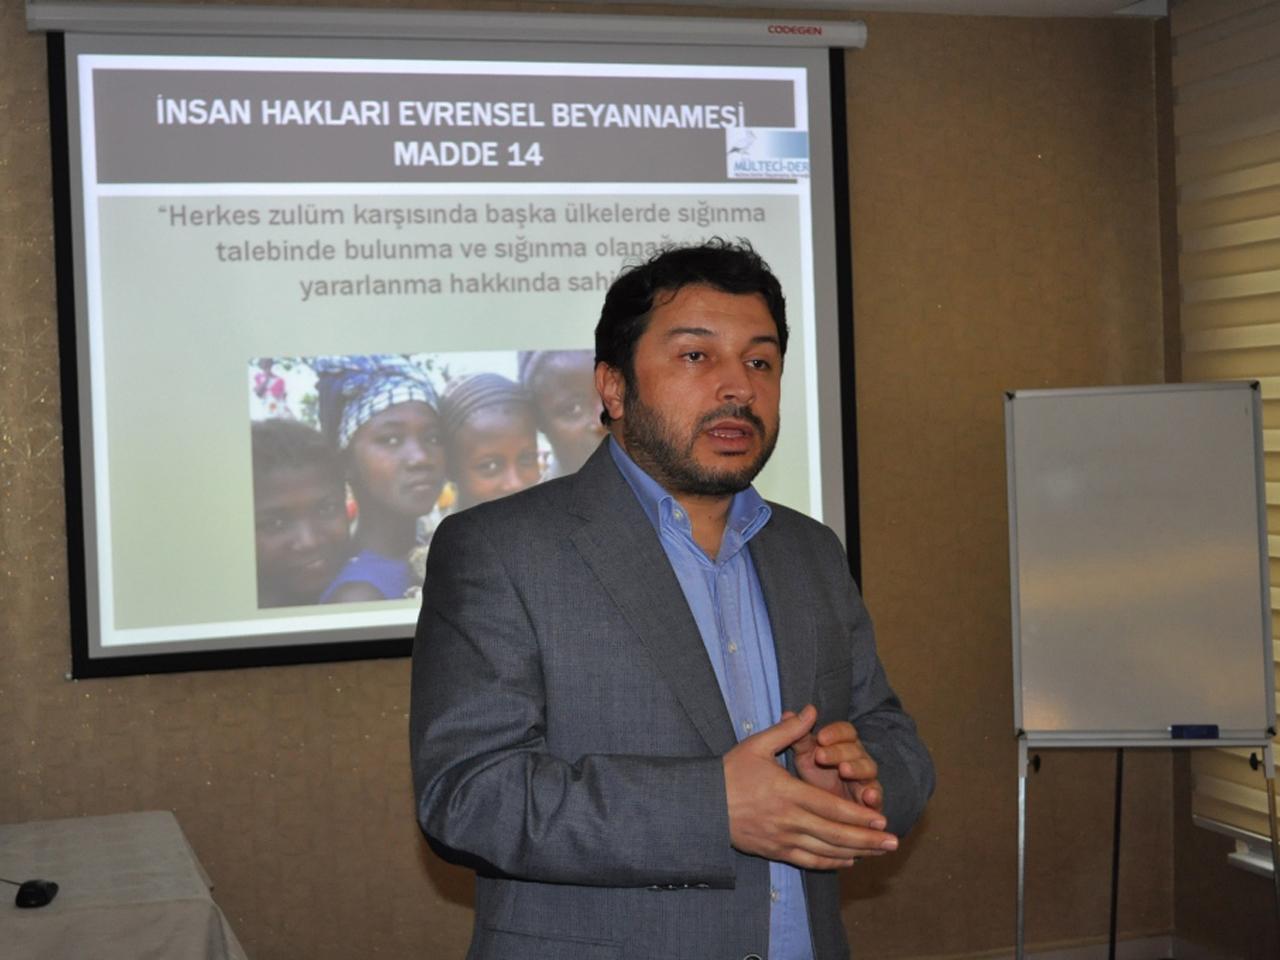 Human rights defender lawyer Taner Kılıç should be released immediately!